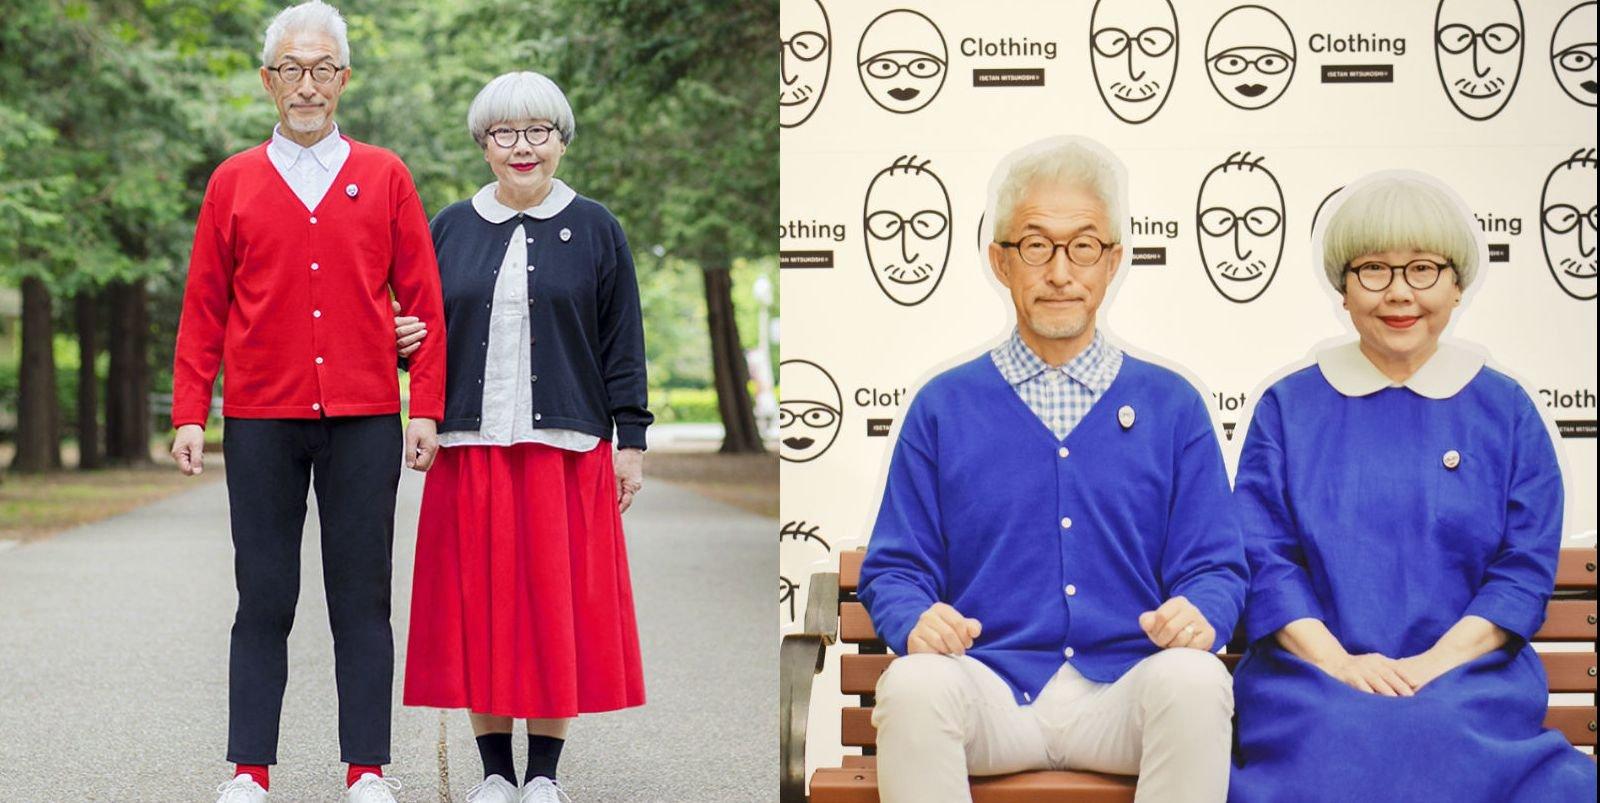 img 5b5a1ad5f2987.png?resize=1200,630 - 日本網紅銀髮夫妻「BonPon」示範穿一輩子都不會過時的情侶裝,只想和你一起慢慢變老~